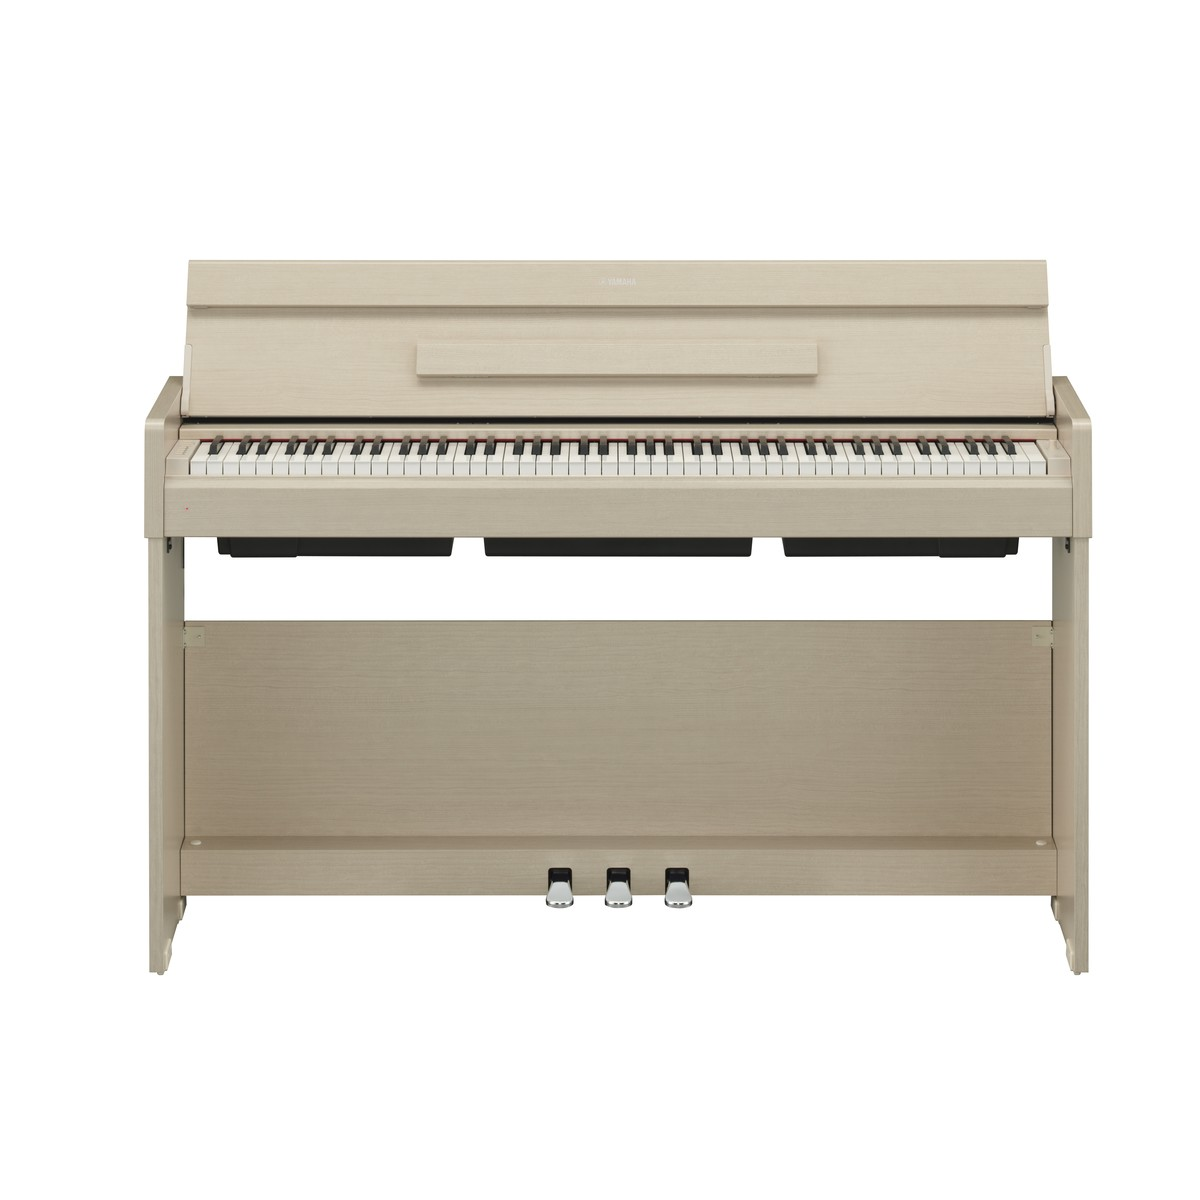 YAMAHA ARIUS YDP-S34 WA PIANOFORTE DIGITALE 88 TASTI PESATI COLORE BIANCO CENERE 1